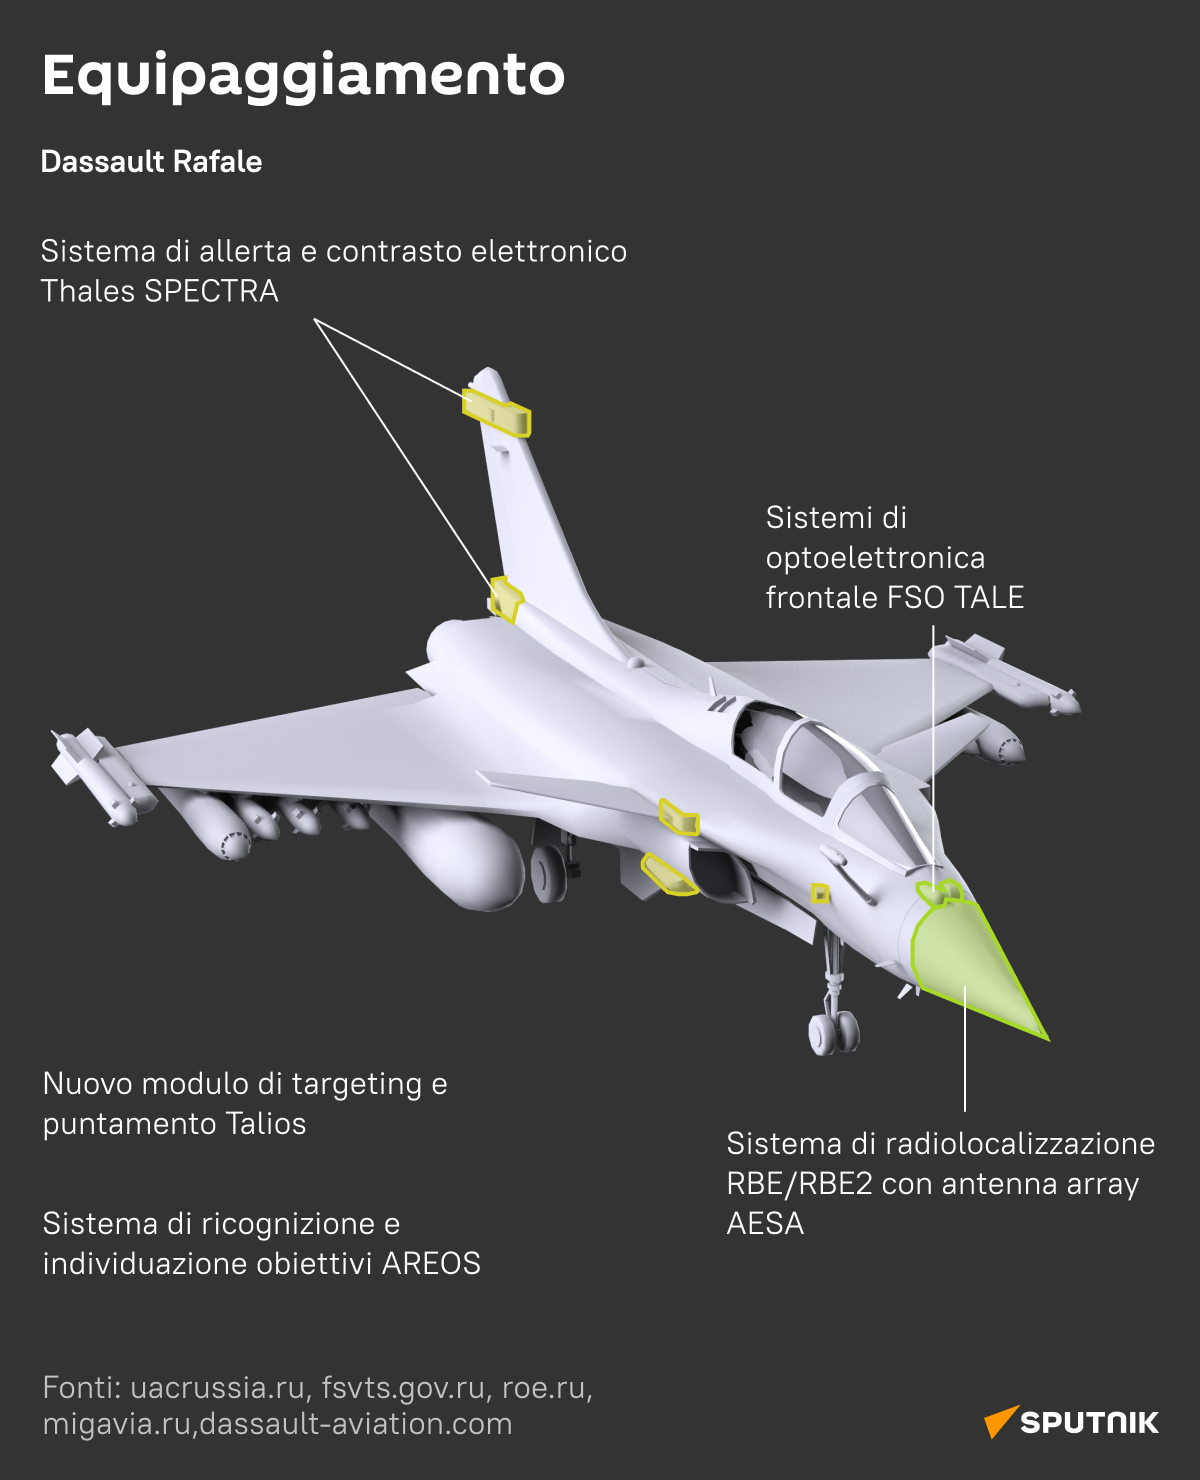 Il russo MiG-35 vs il francese Rafale 4 - Sputnik Italia